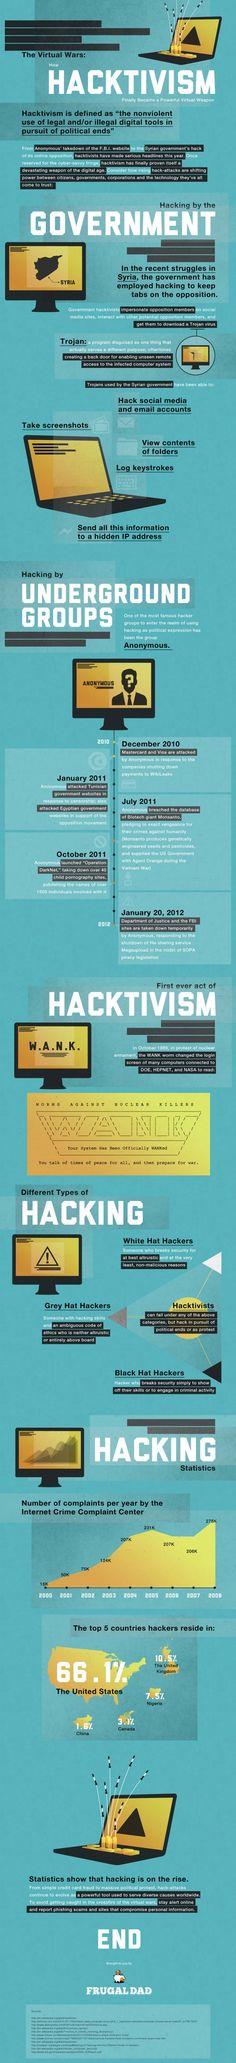 History of Hacktivism